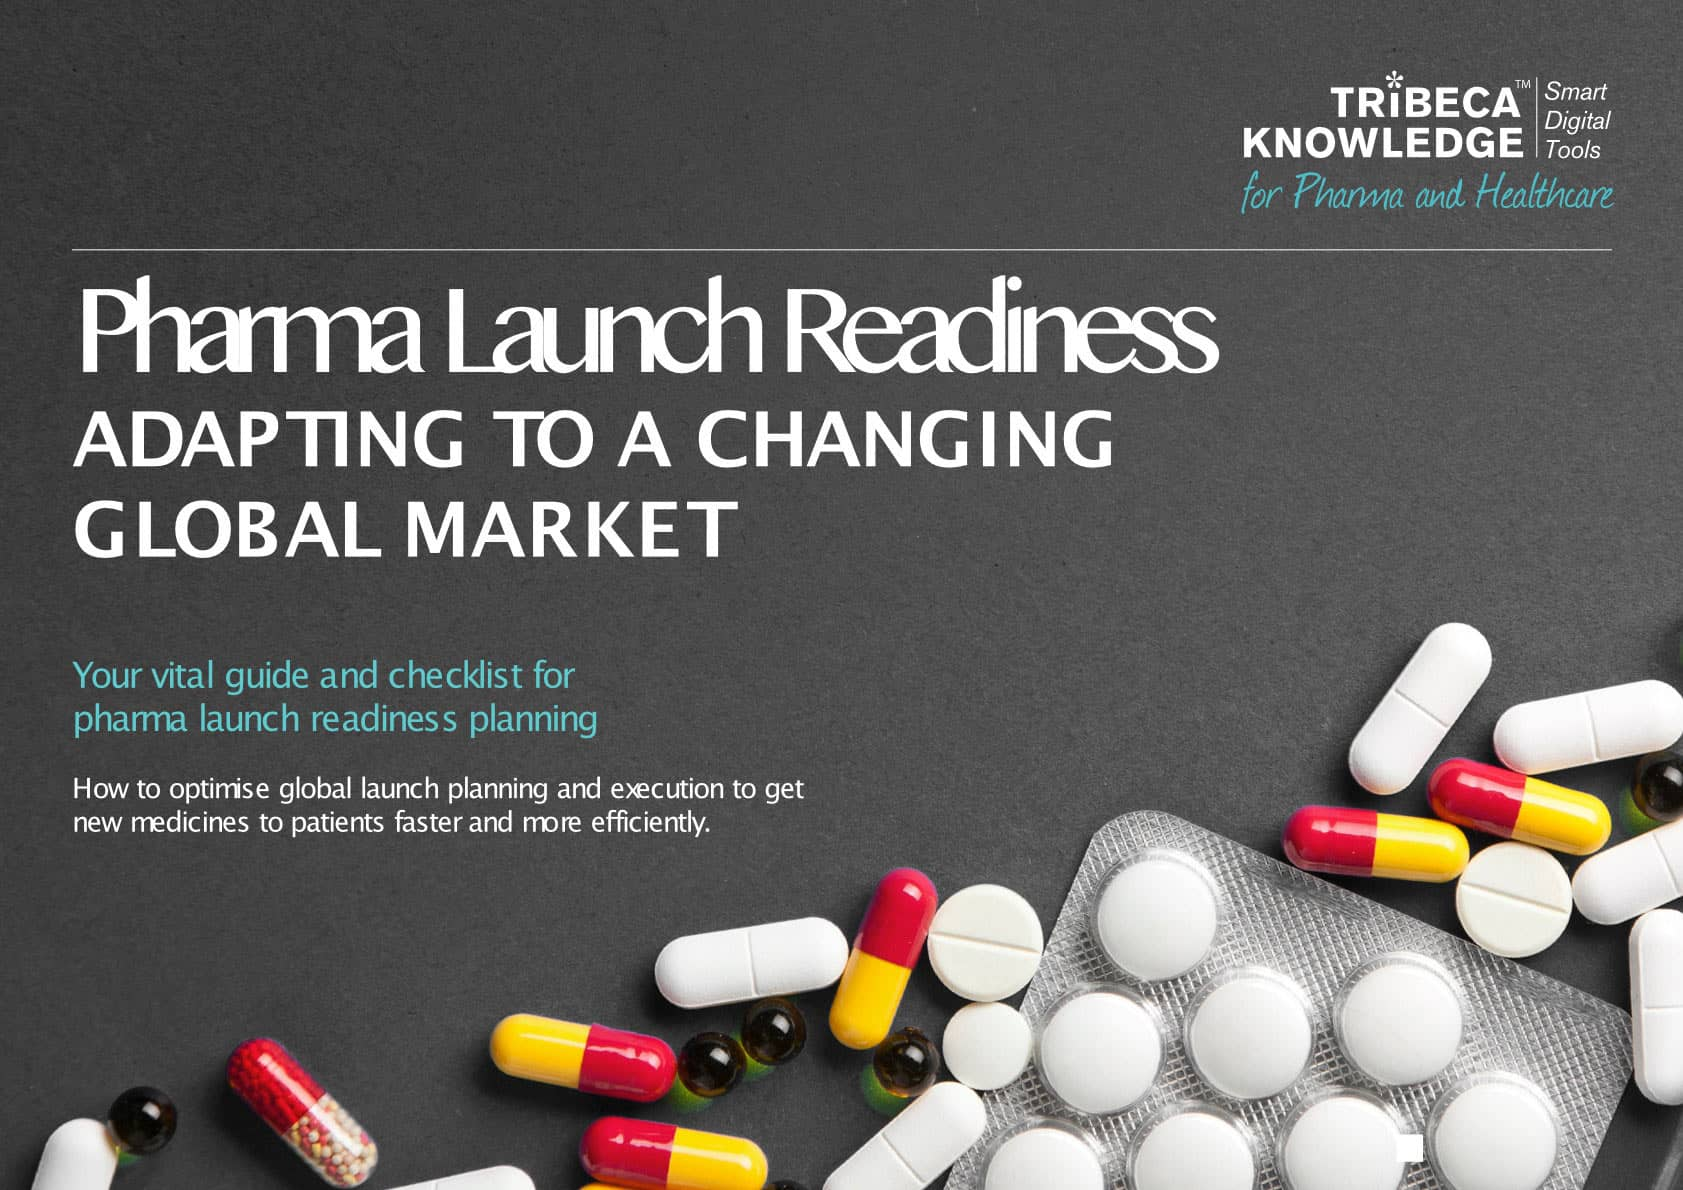 Pharma launch readiness checklist guide (2)